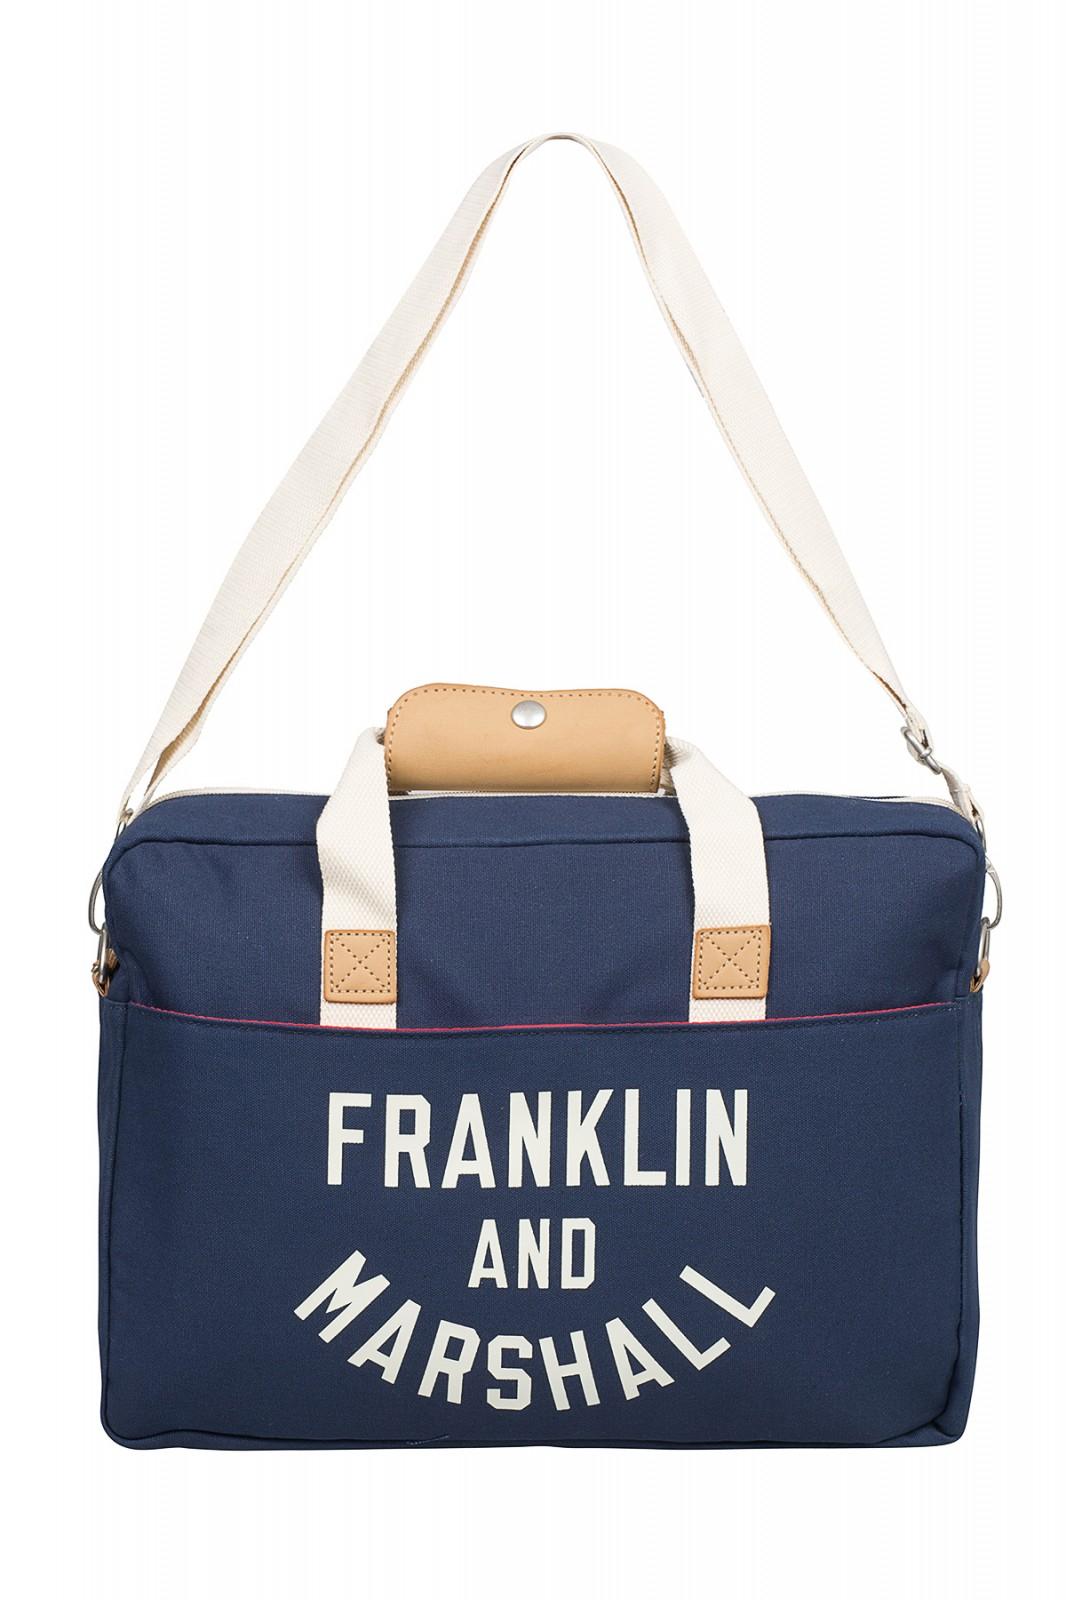 FRANKLIN AND MARSHALL Varsity Reporter Bag Umhänge-Tasche Blau 154FMB732.25